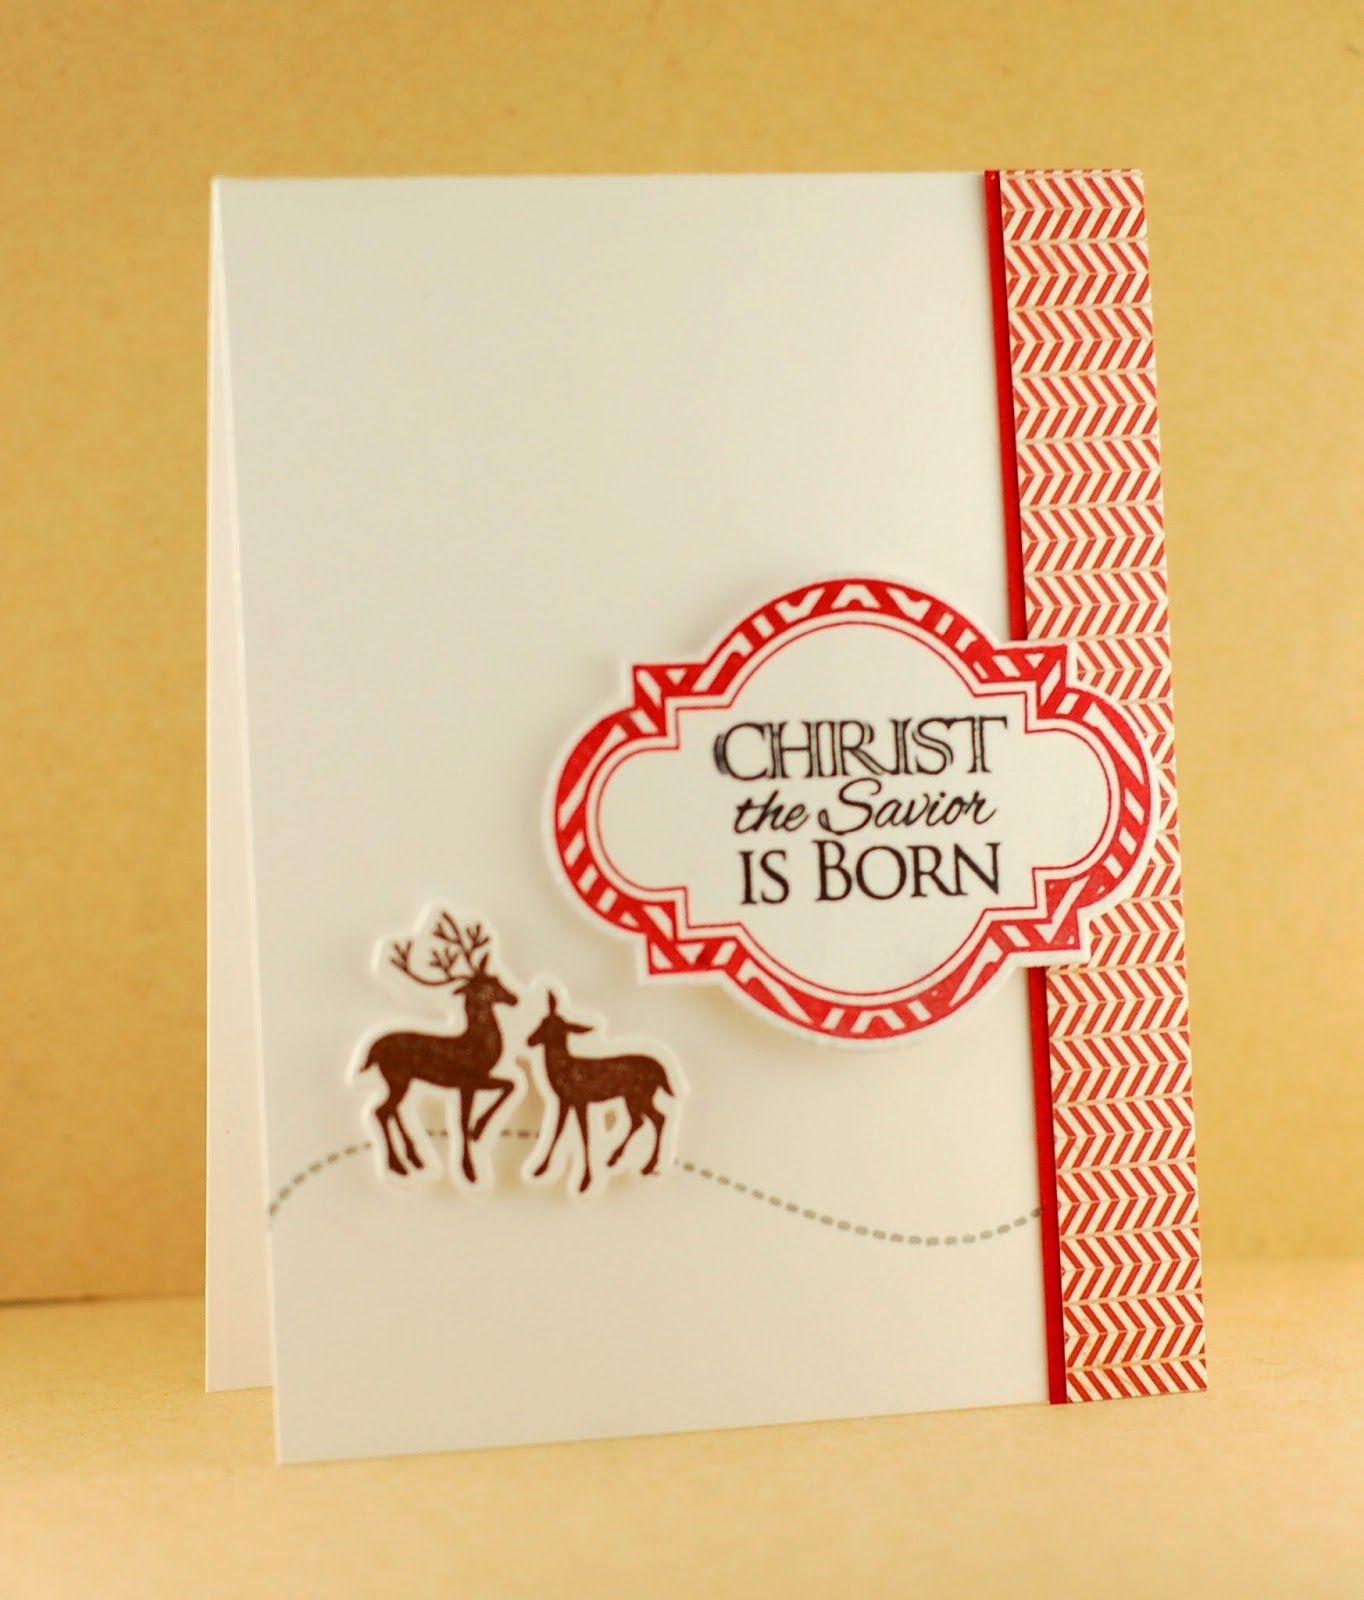 Festive Friday Reminder: Christ the Savior is Born